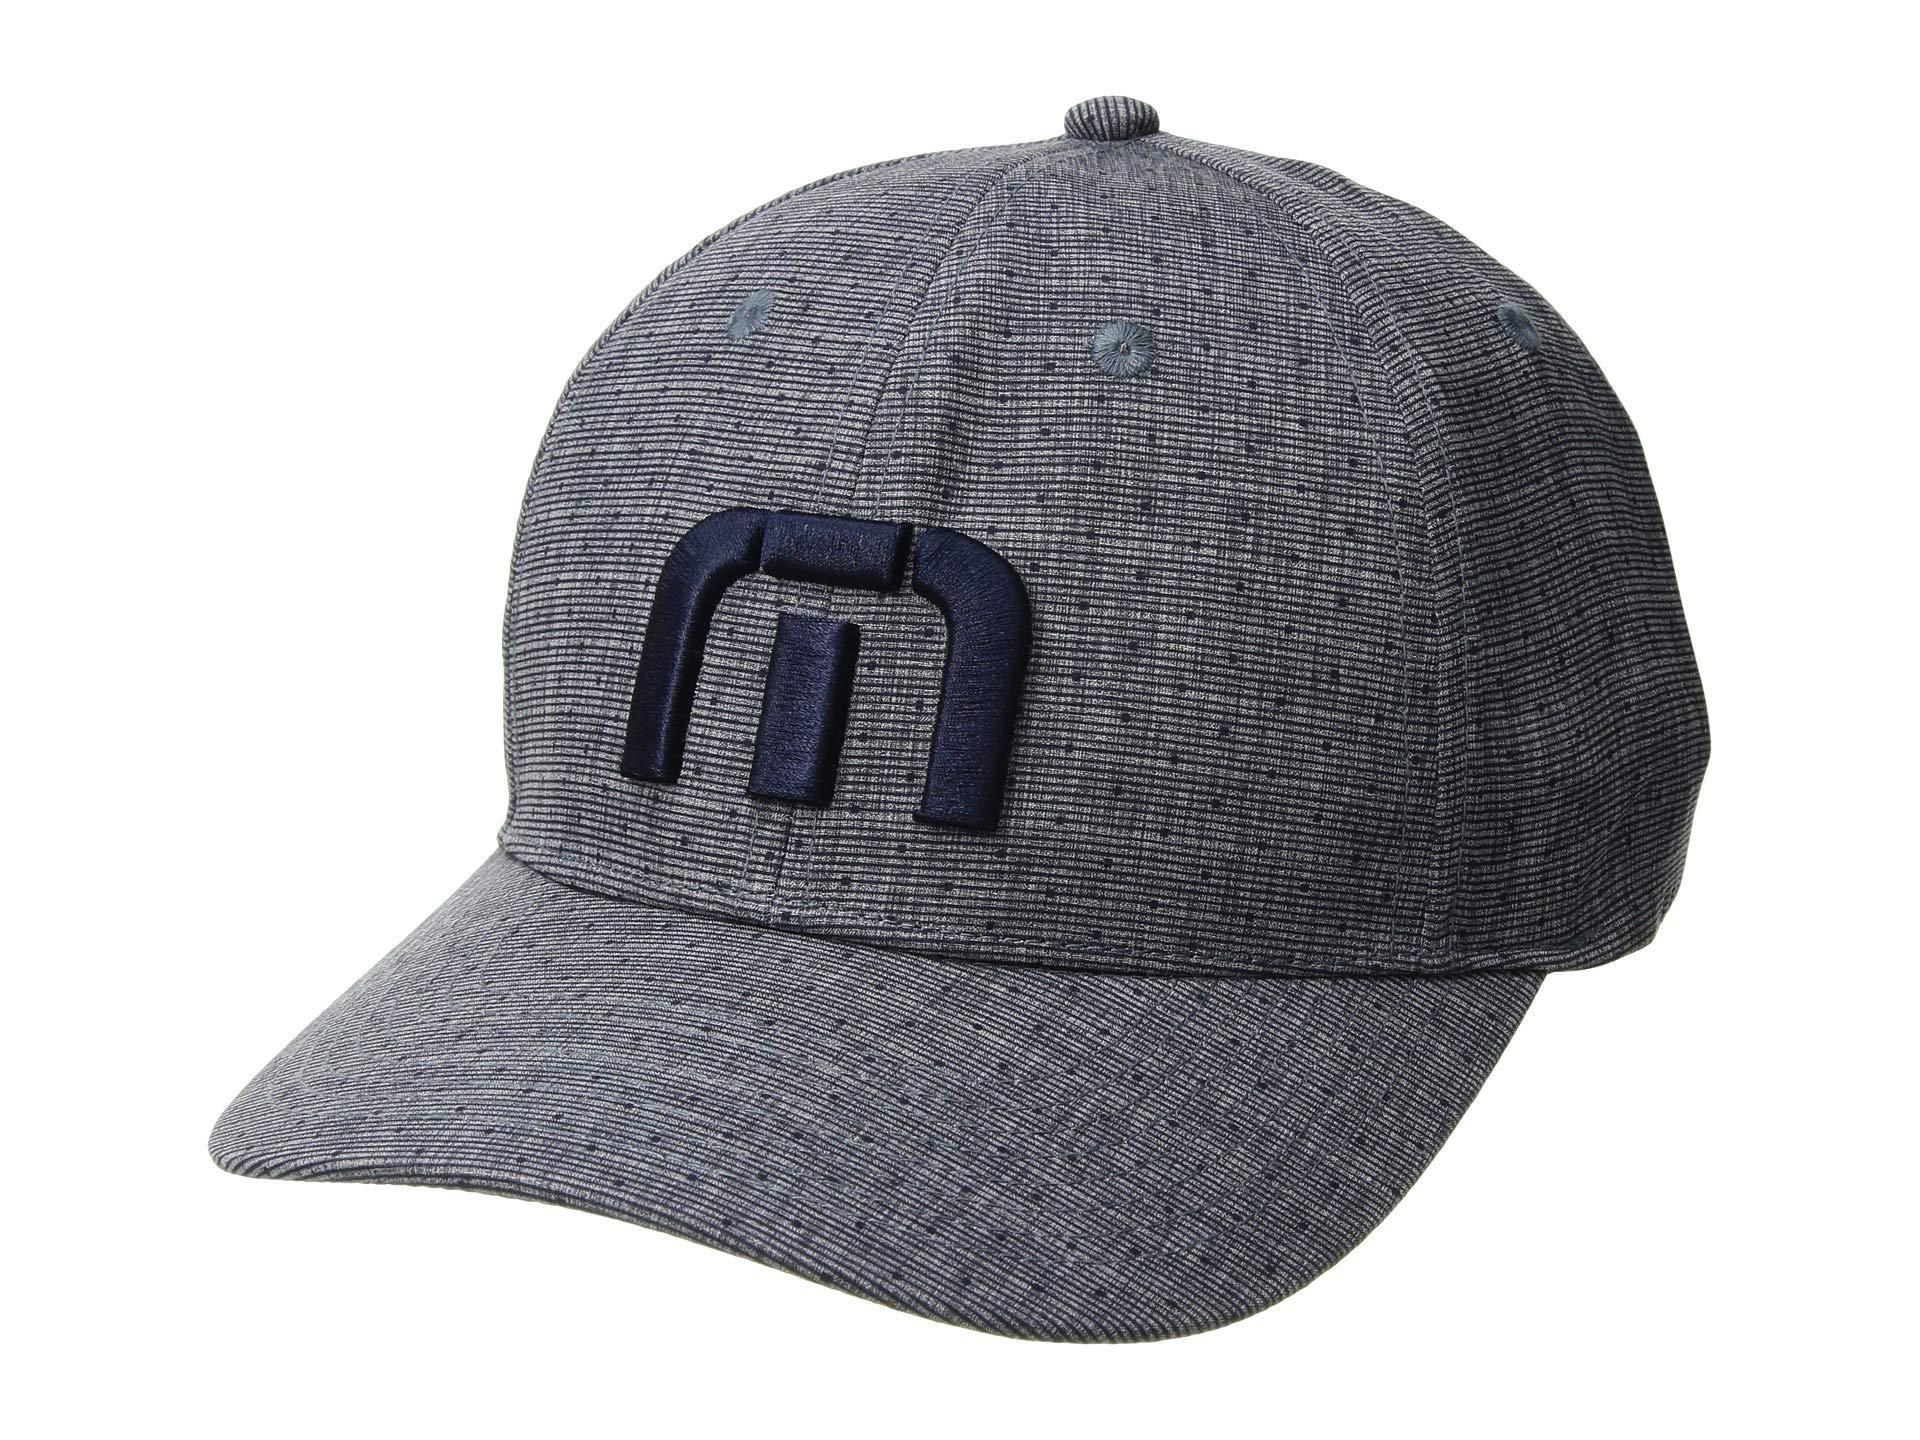 timeless design fc44c 9ba7e ... where can i buy lyst travis mathew trefoil heather blue nights baseball  caps in df078 6b3cf